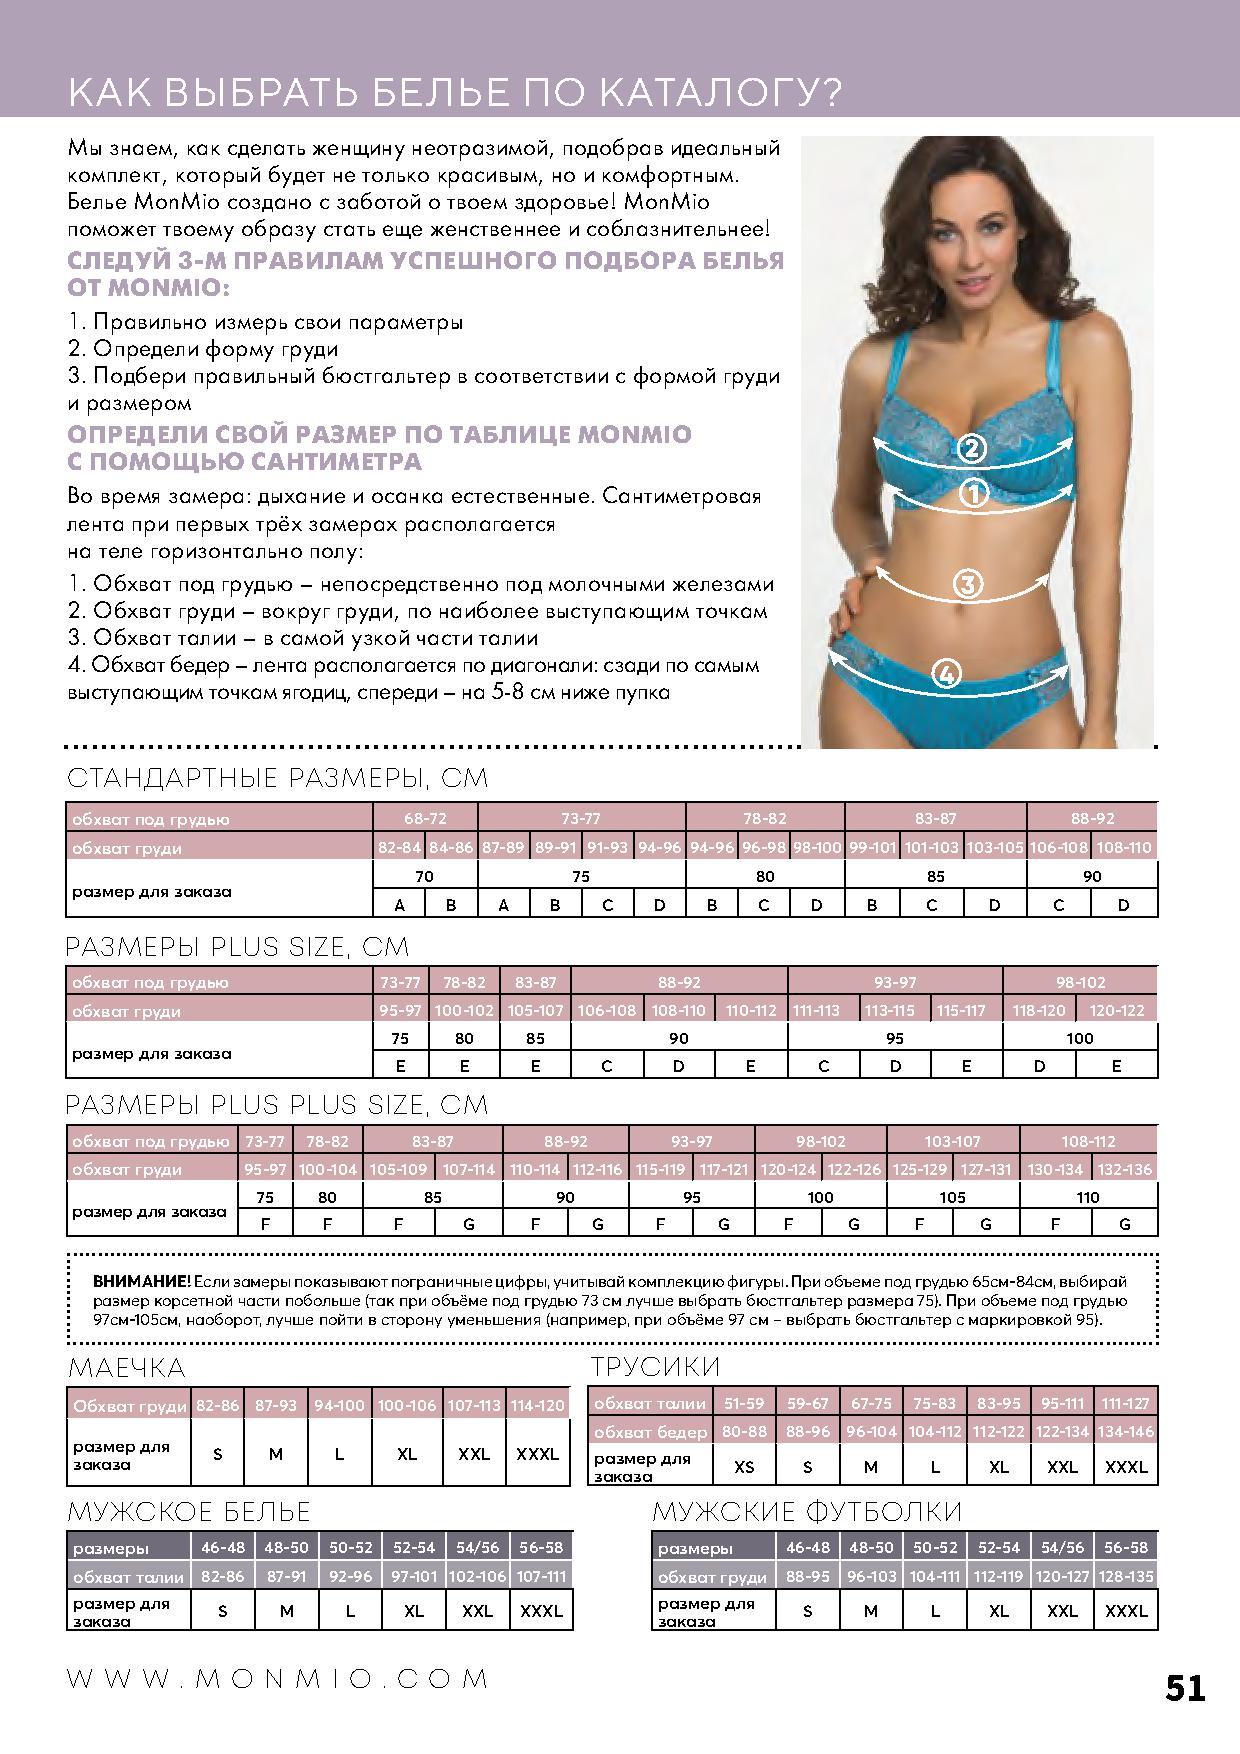 МонМио таблица размеров